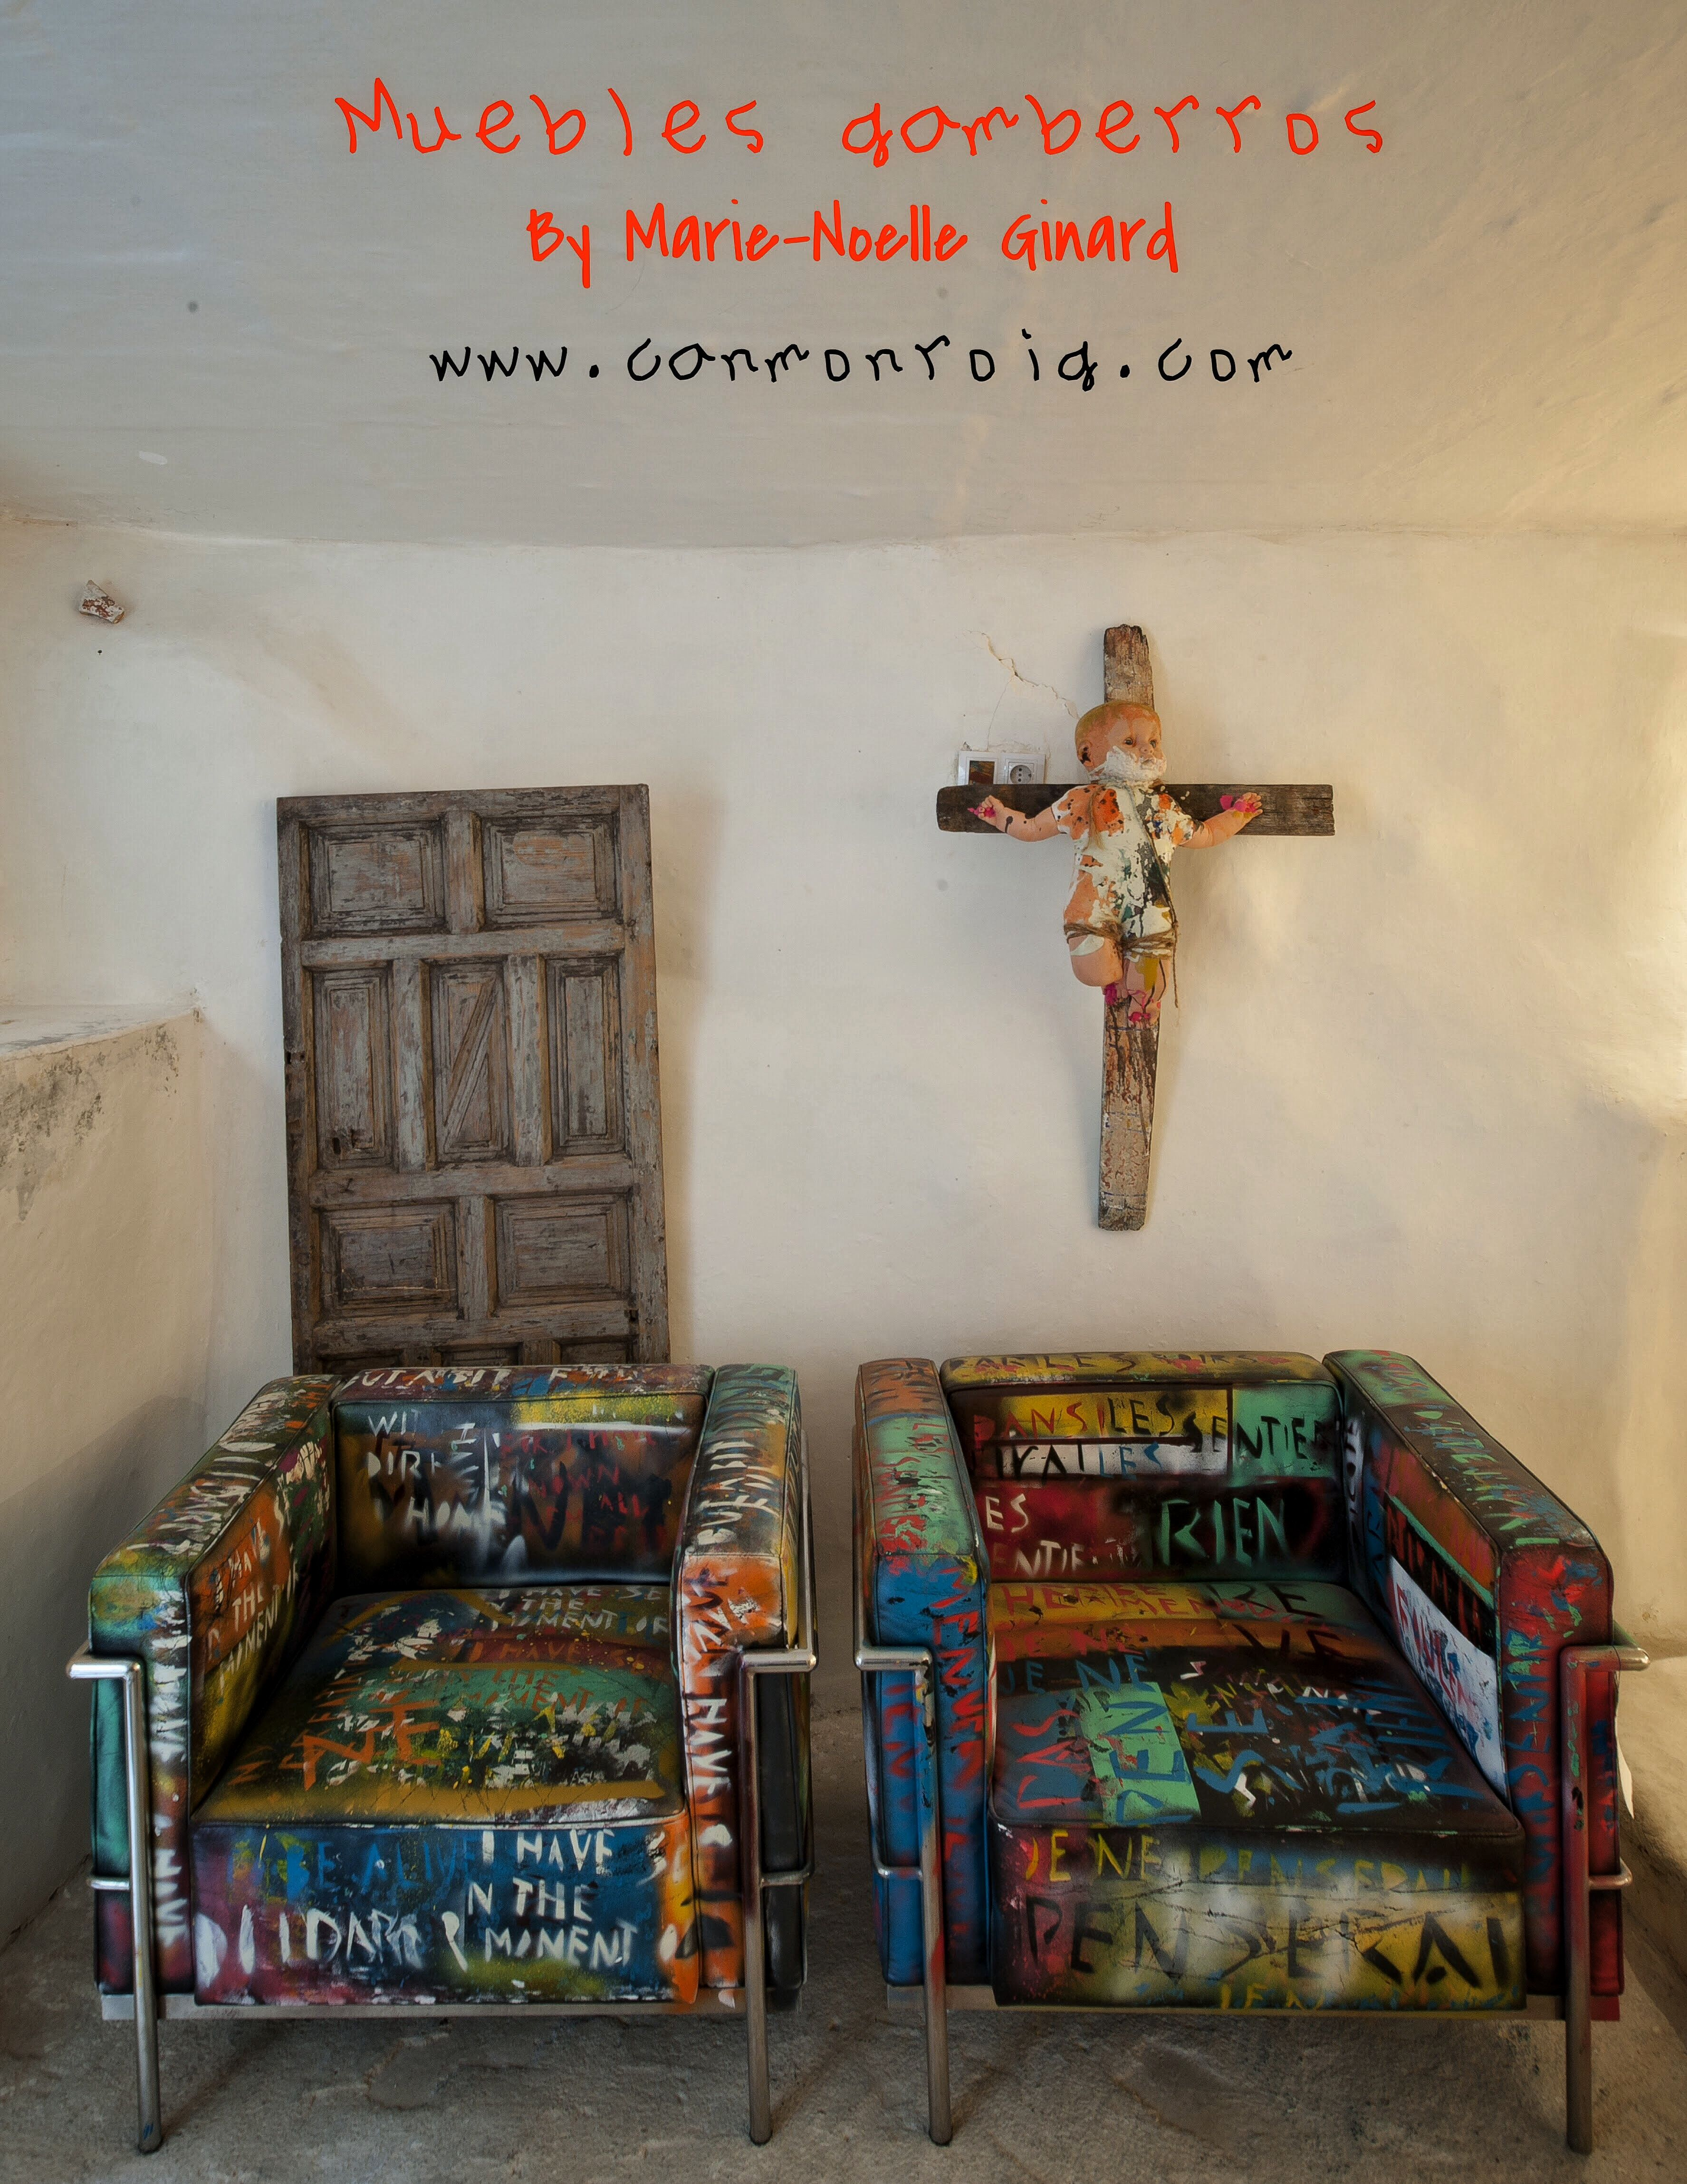 Muebles Gamberros By Can Monroig Decoraci N Y Arte Gamberro  # Muebles Nervion